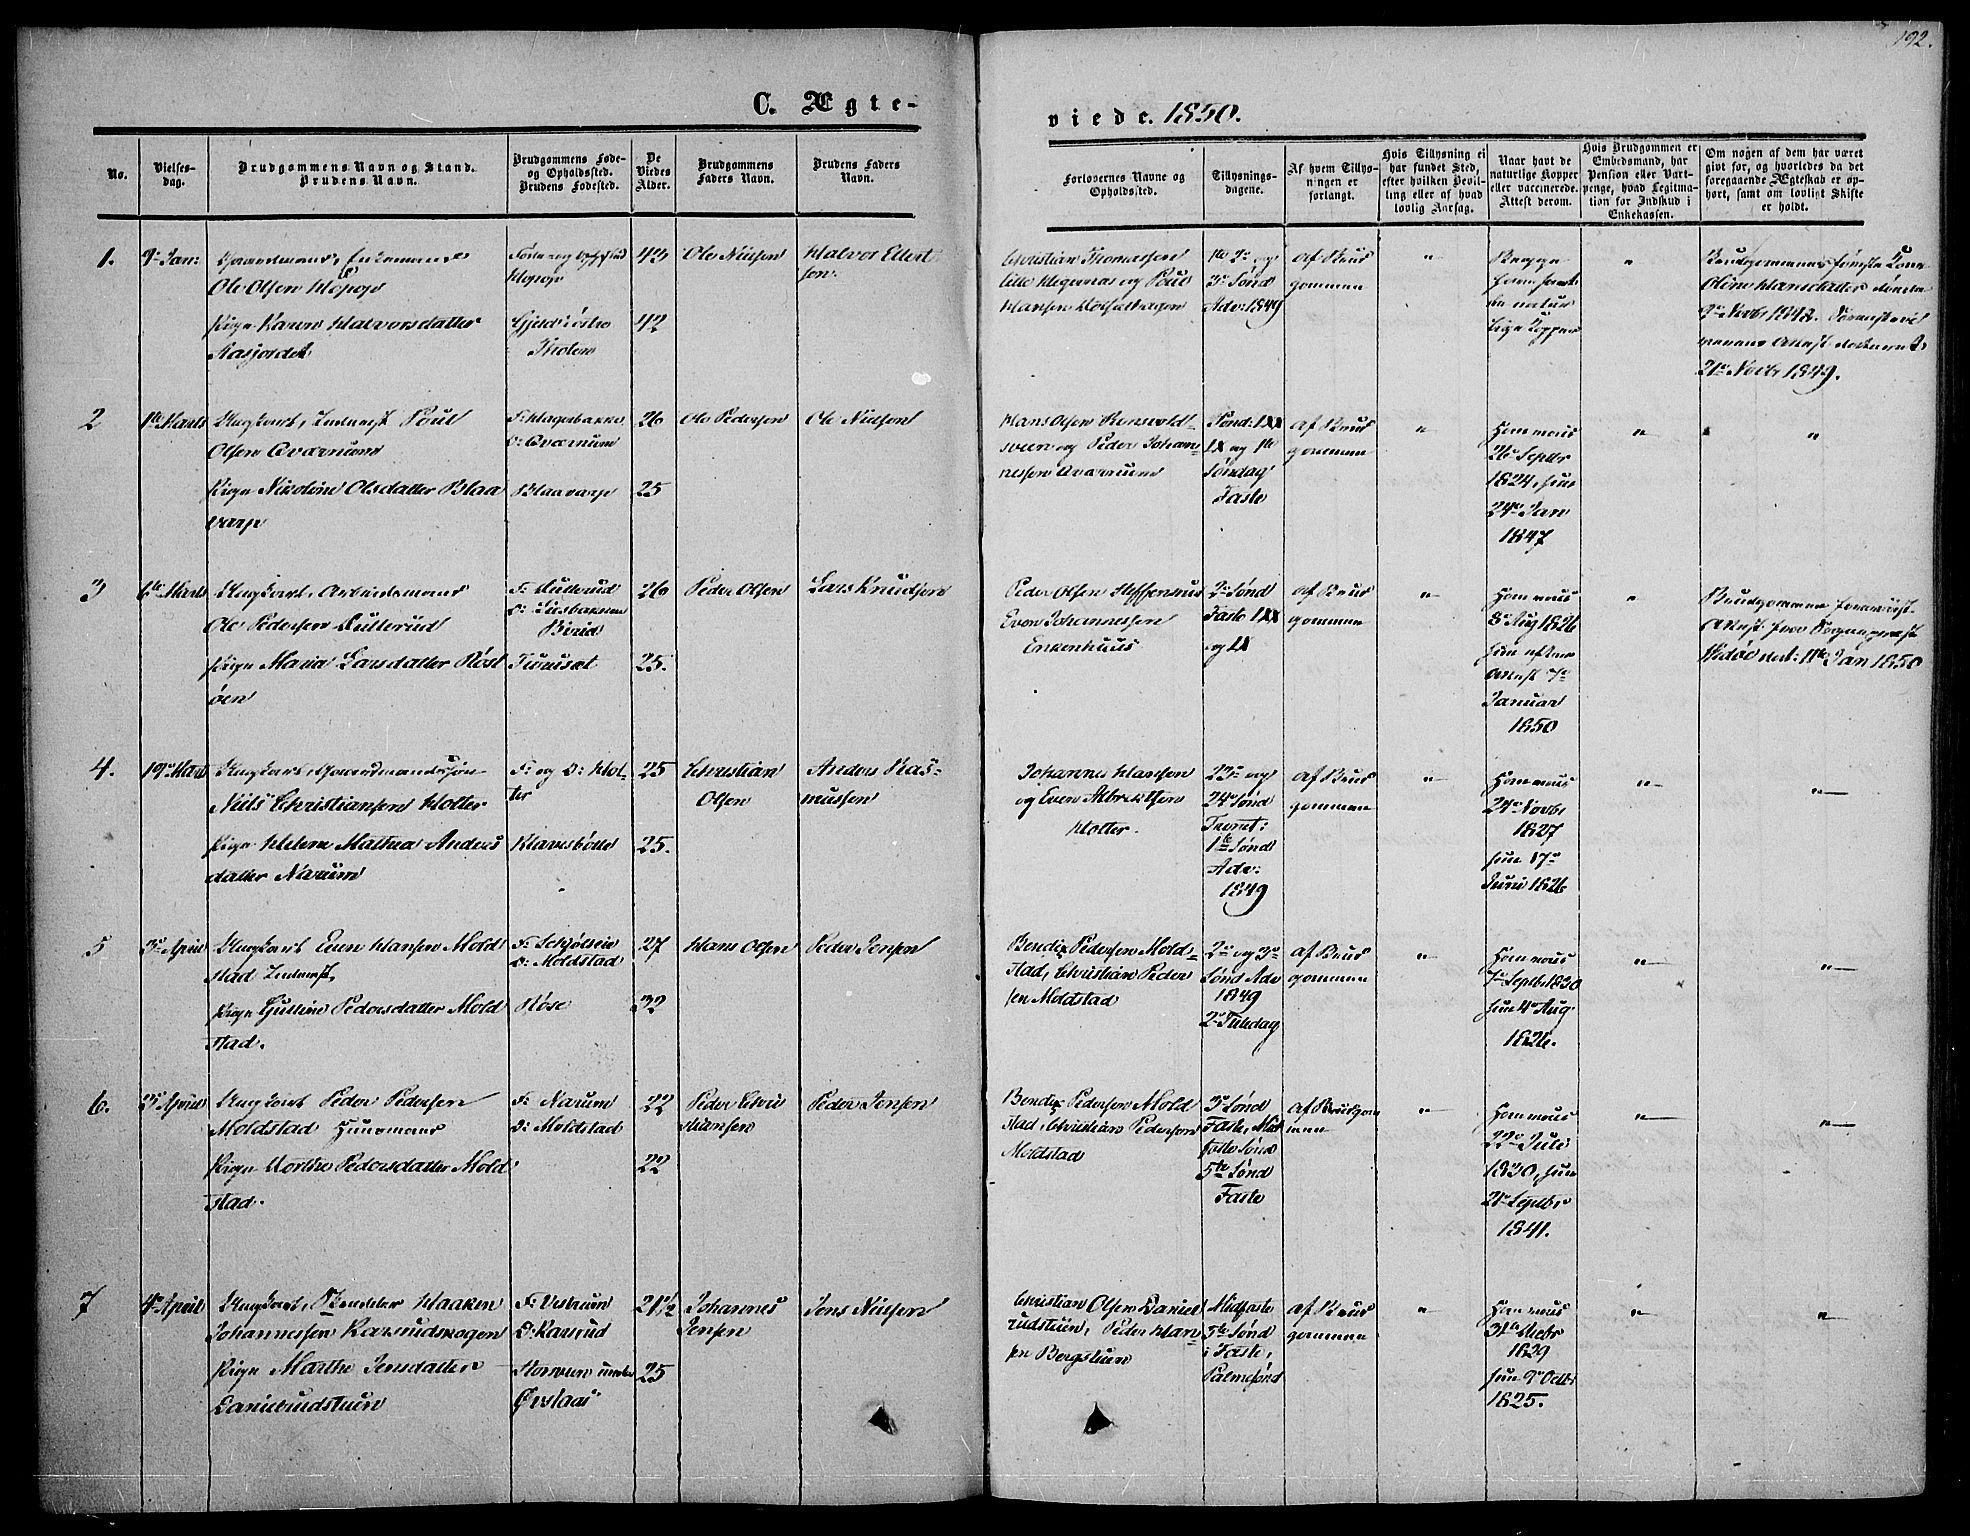 SAH, Vestre Toten prestekontor, H/Ha/Haa/L0005: Ministerialbok nr. 5, 1850-1855, s. 192